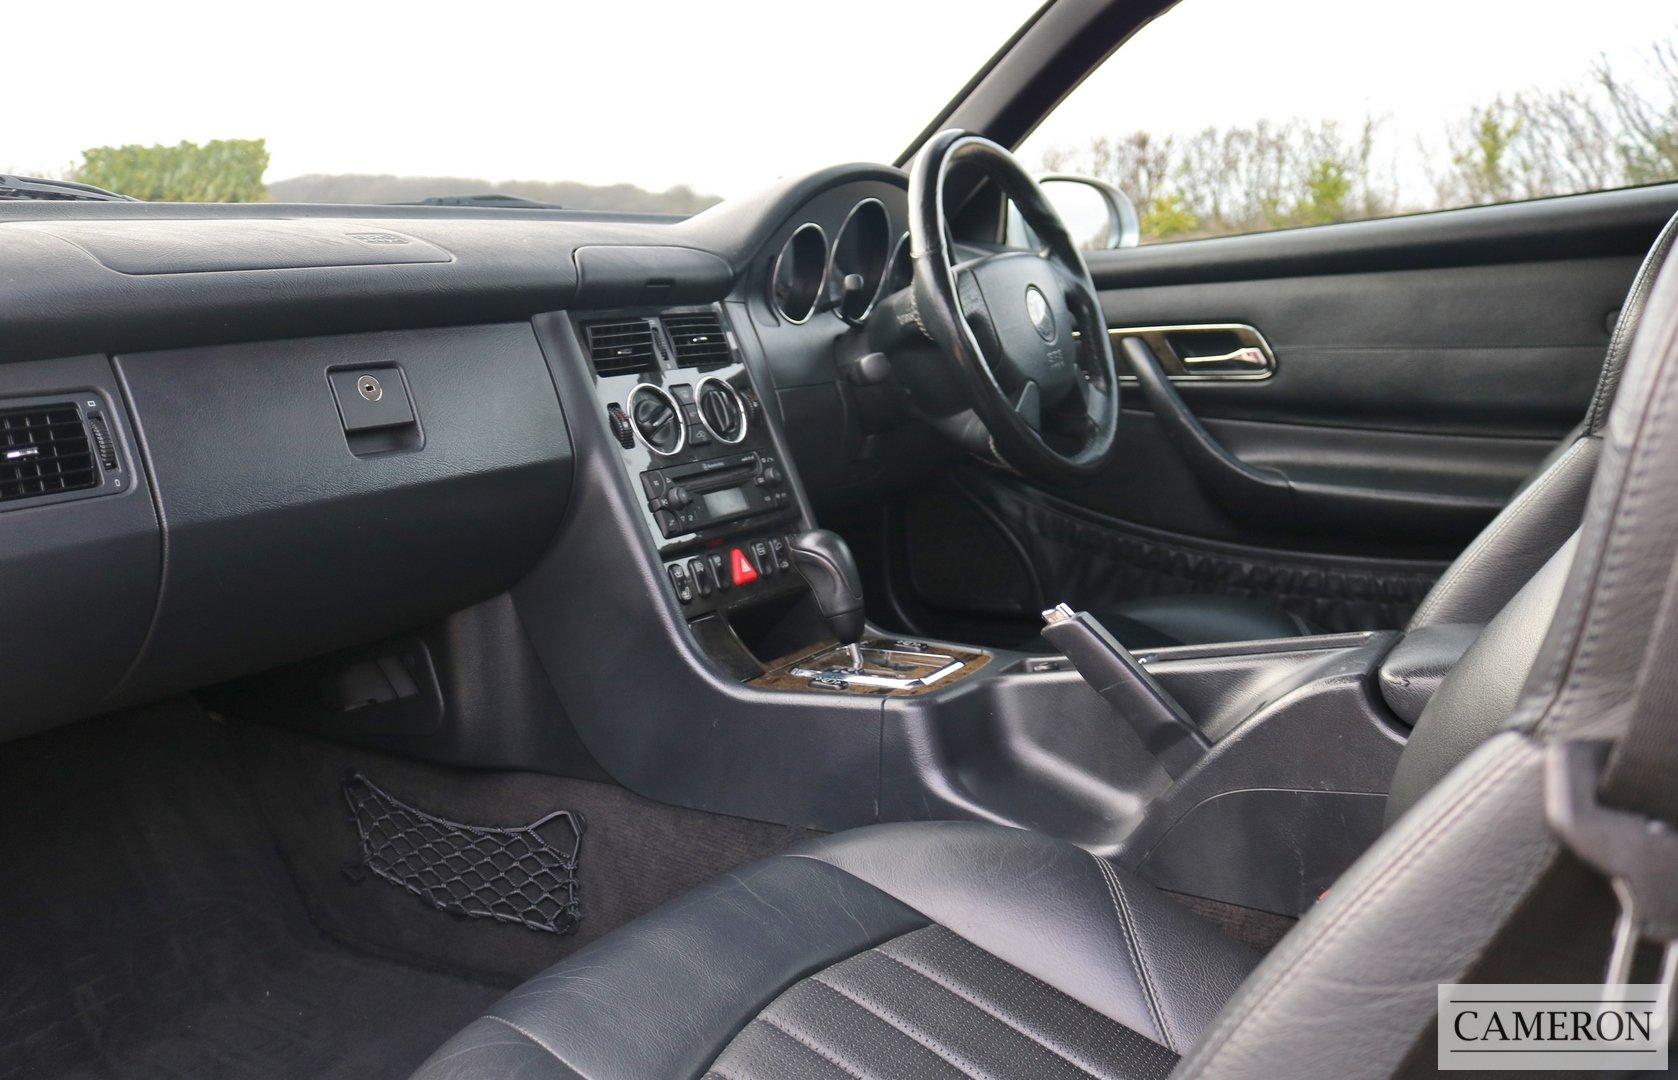 2003 Mercedes Benz SLK 32 AMG  For Sale (picture 3 of 6)